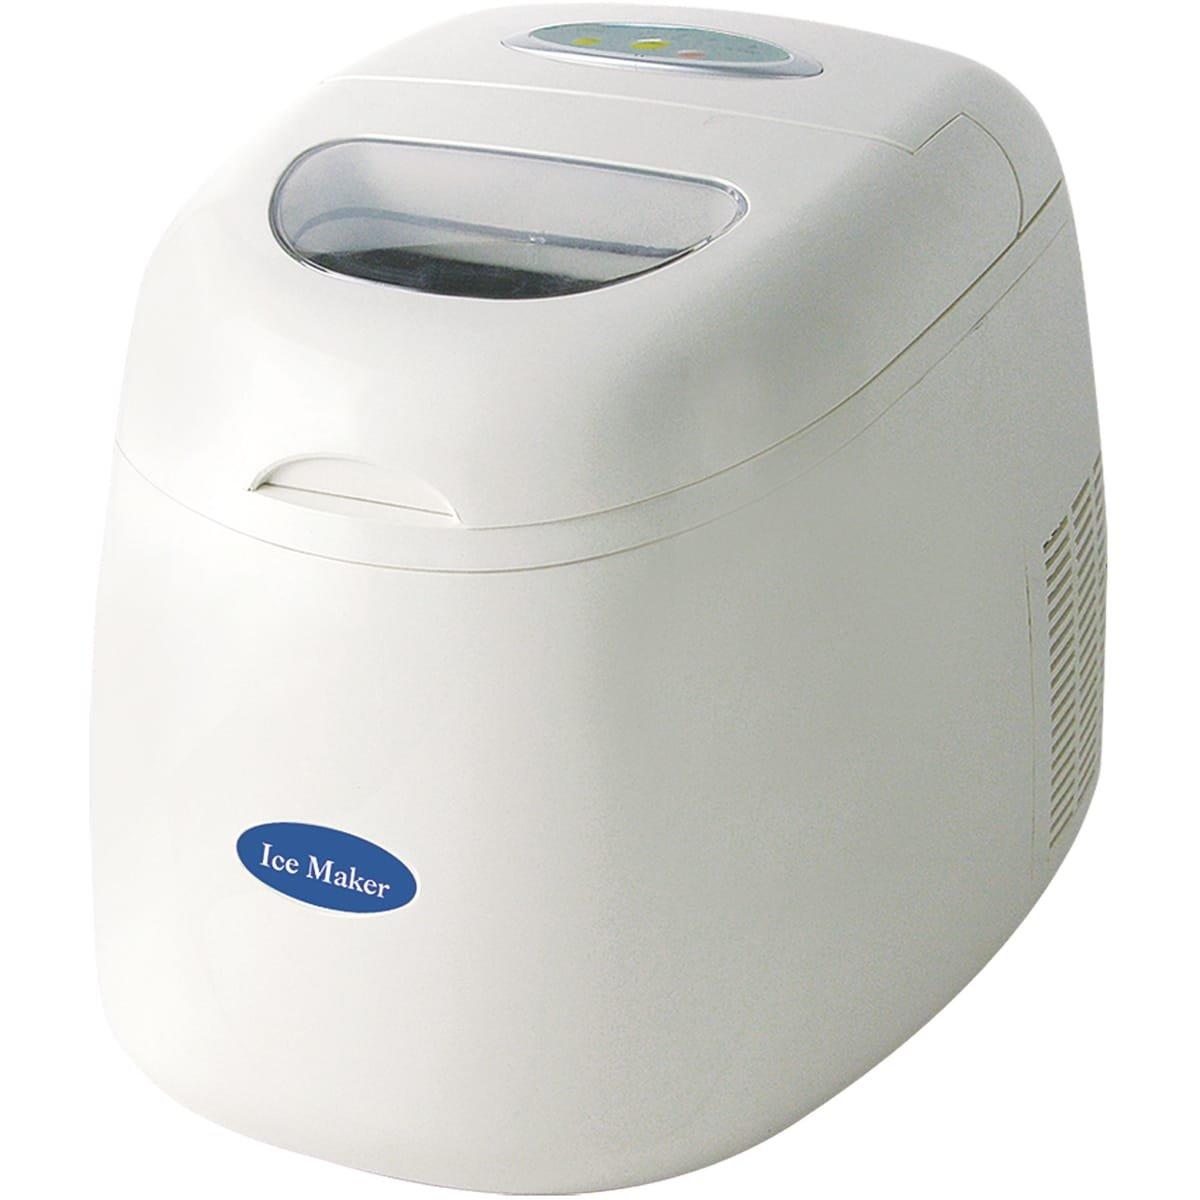 Evatronic - 1118 - Machine à glaçons 150w 12kg/24h blanc Ice Maker